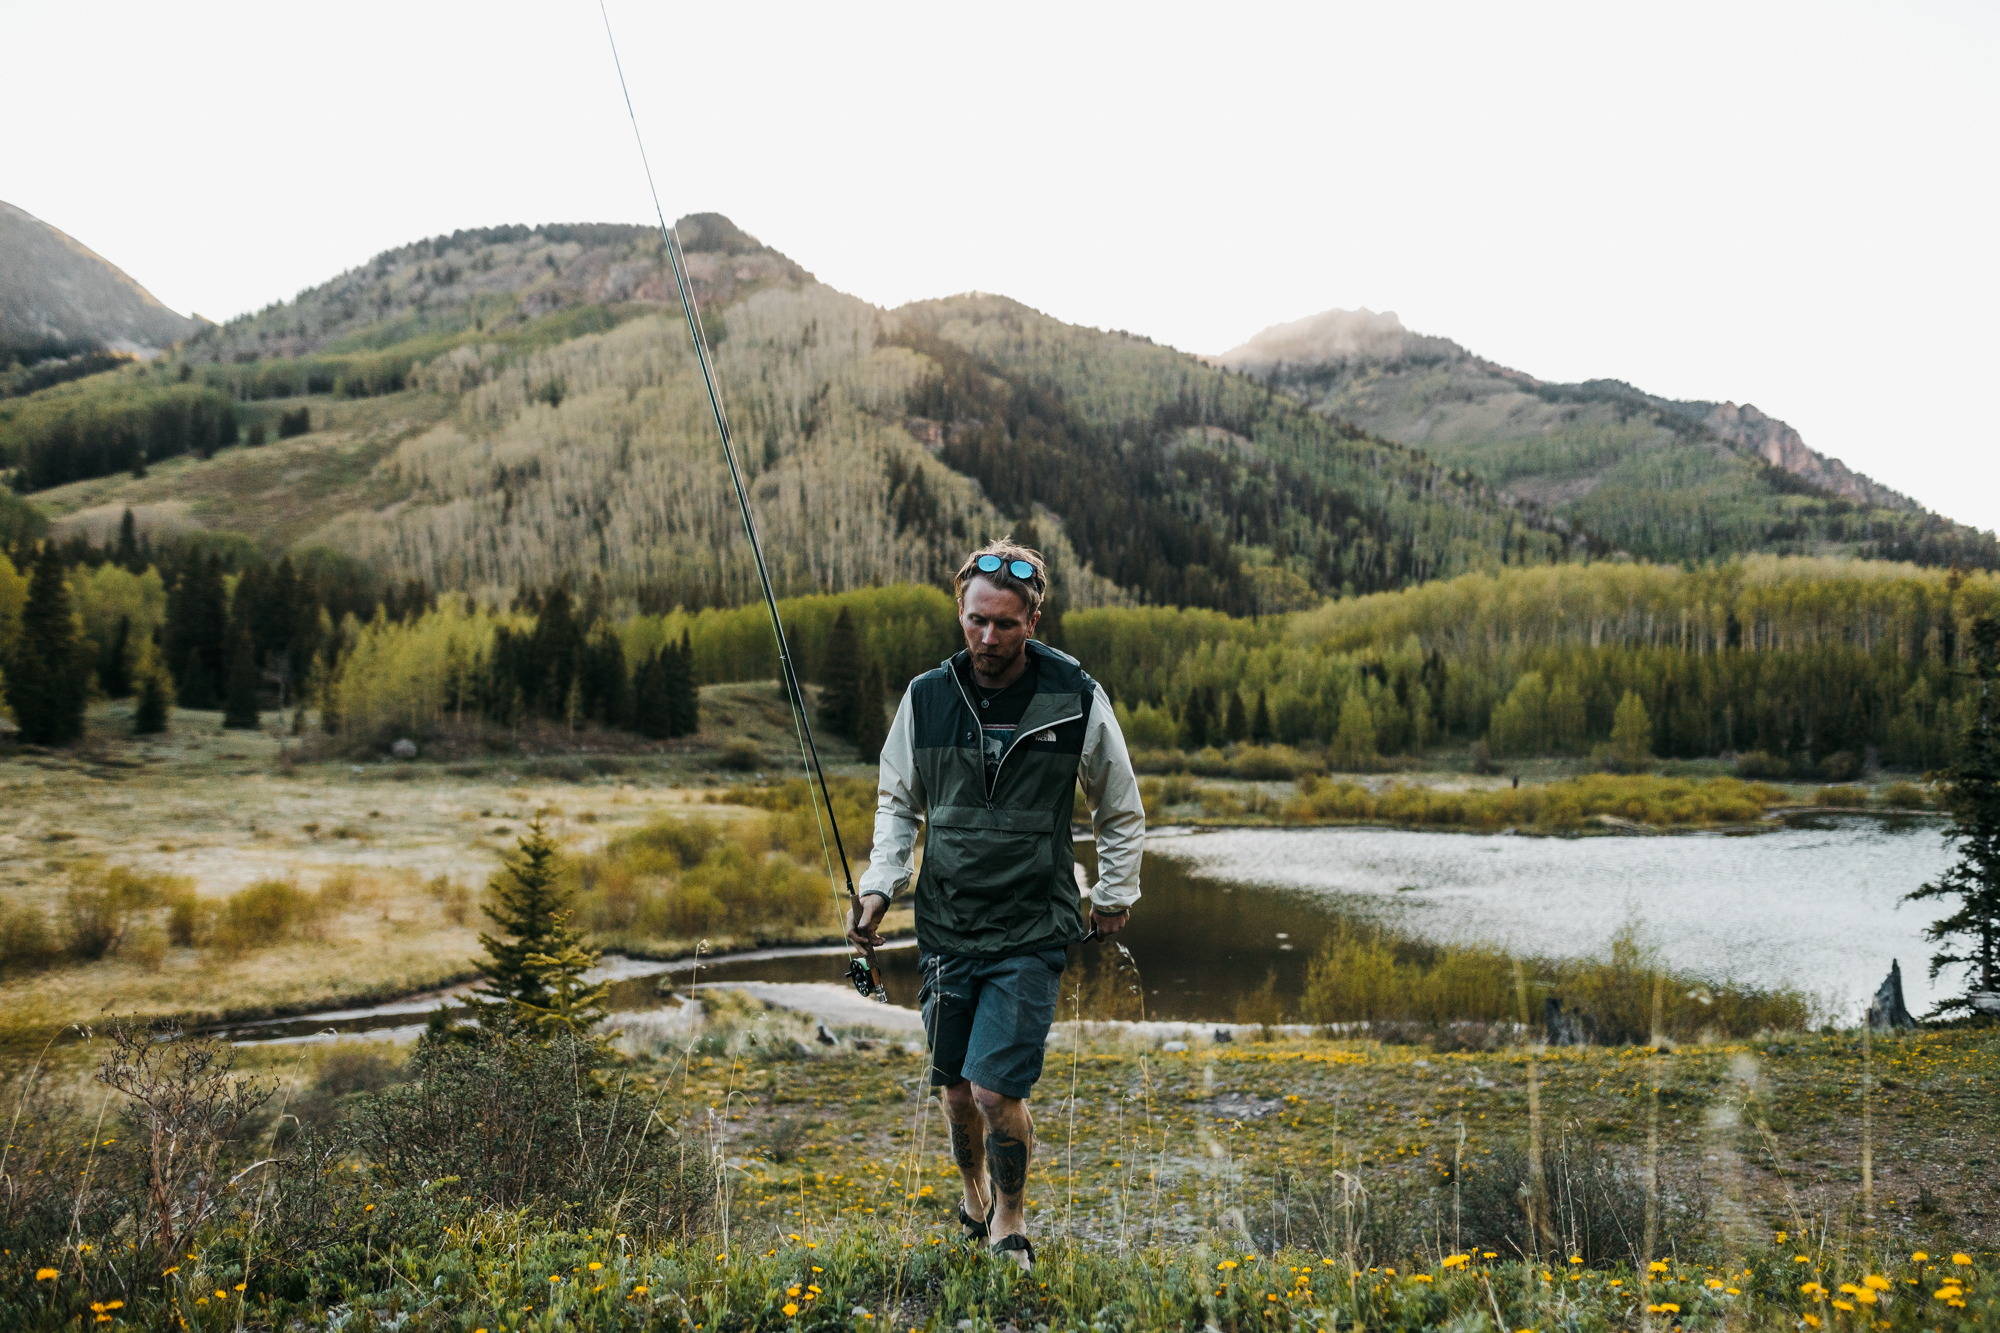 Fly fishing in Telluride Colorado